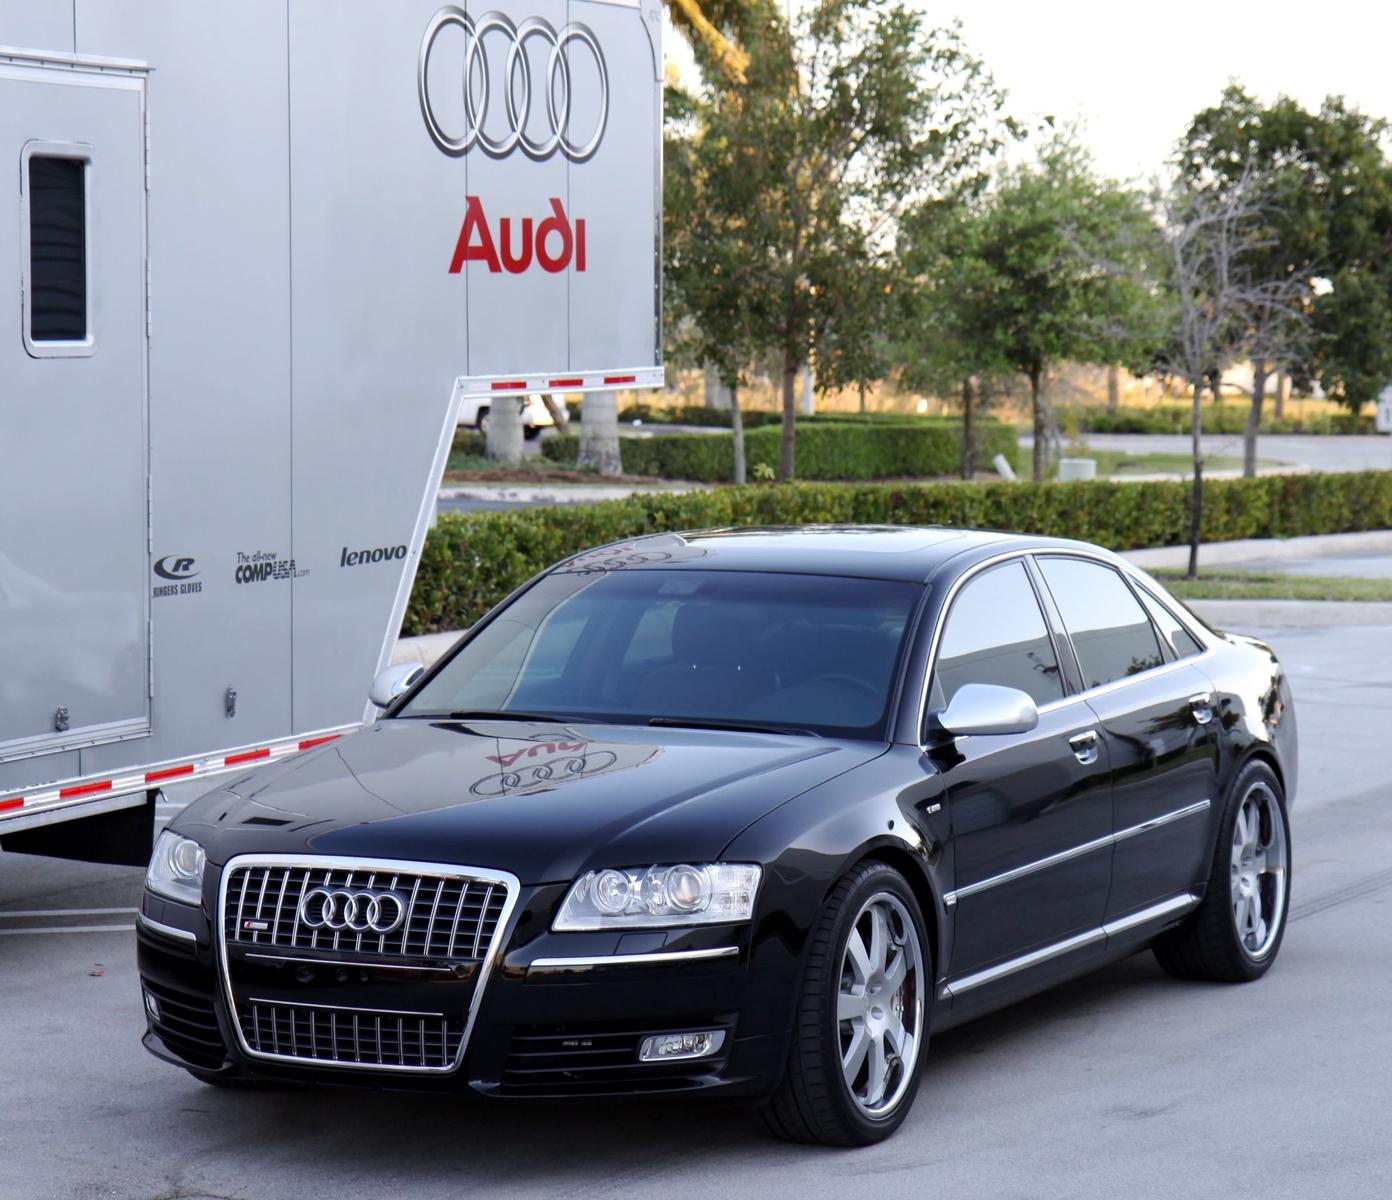 2006 Audi A8 Image 11